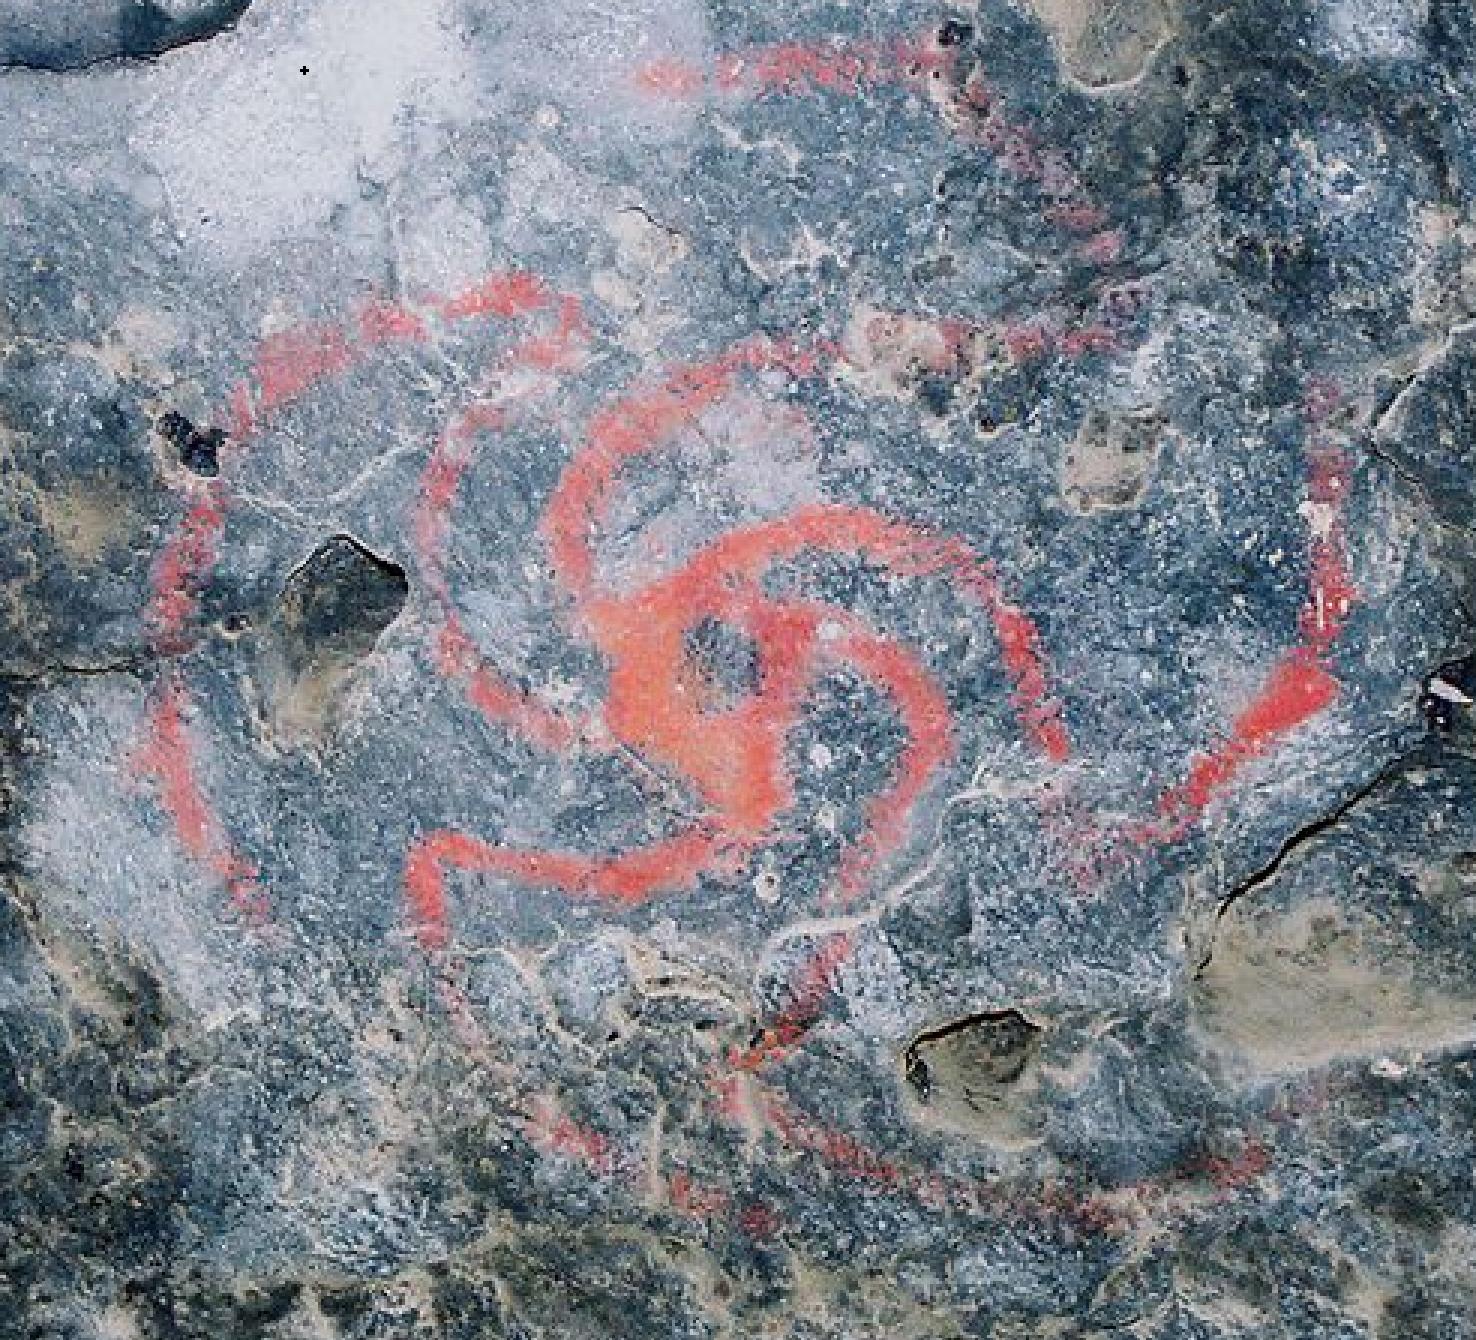 Ancient rock art shows prehistoric people 'used hallucinogenic drugs'